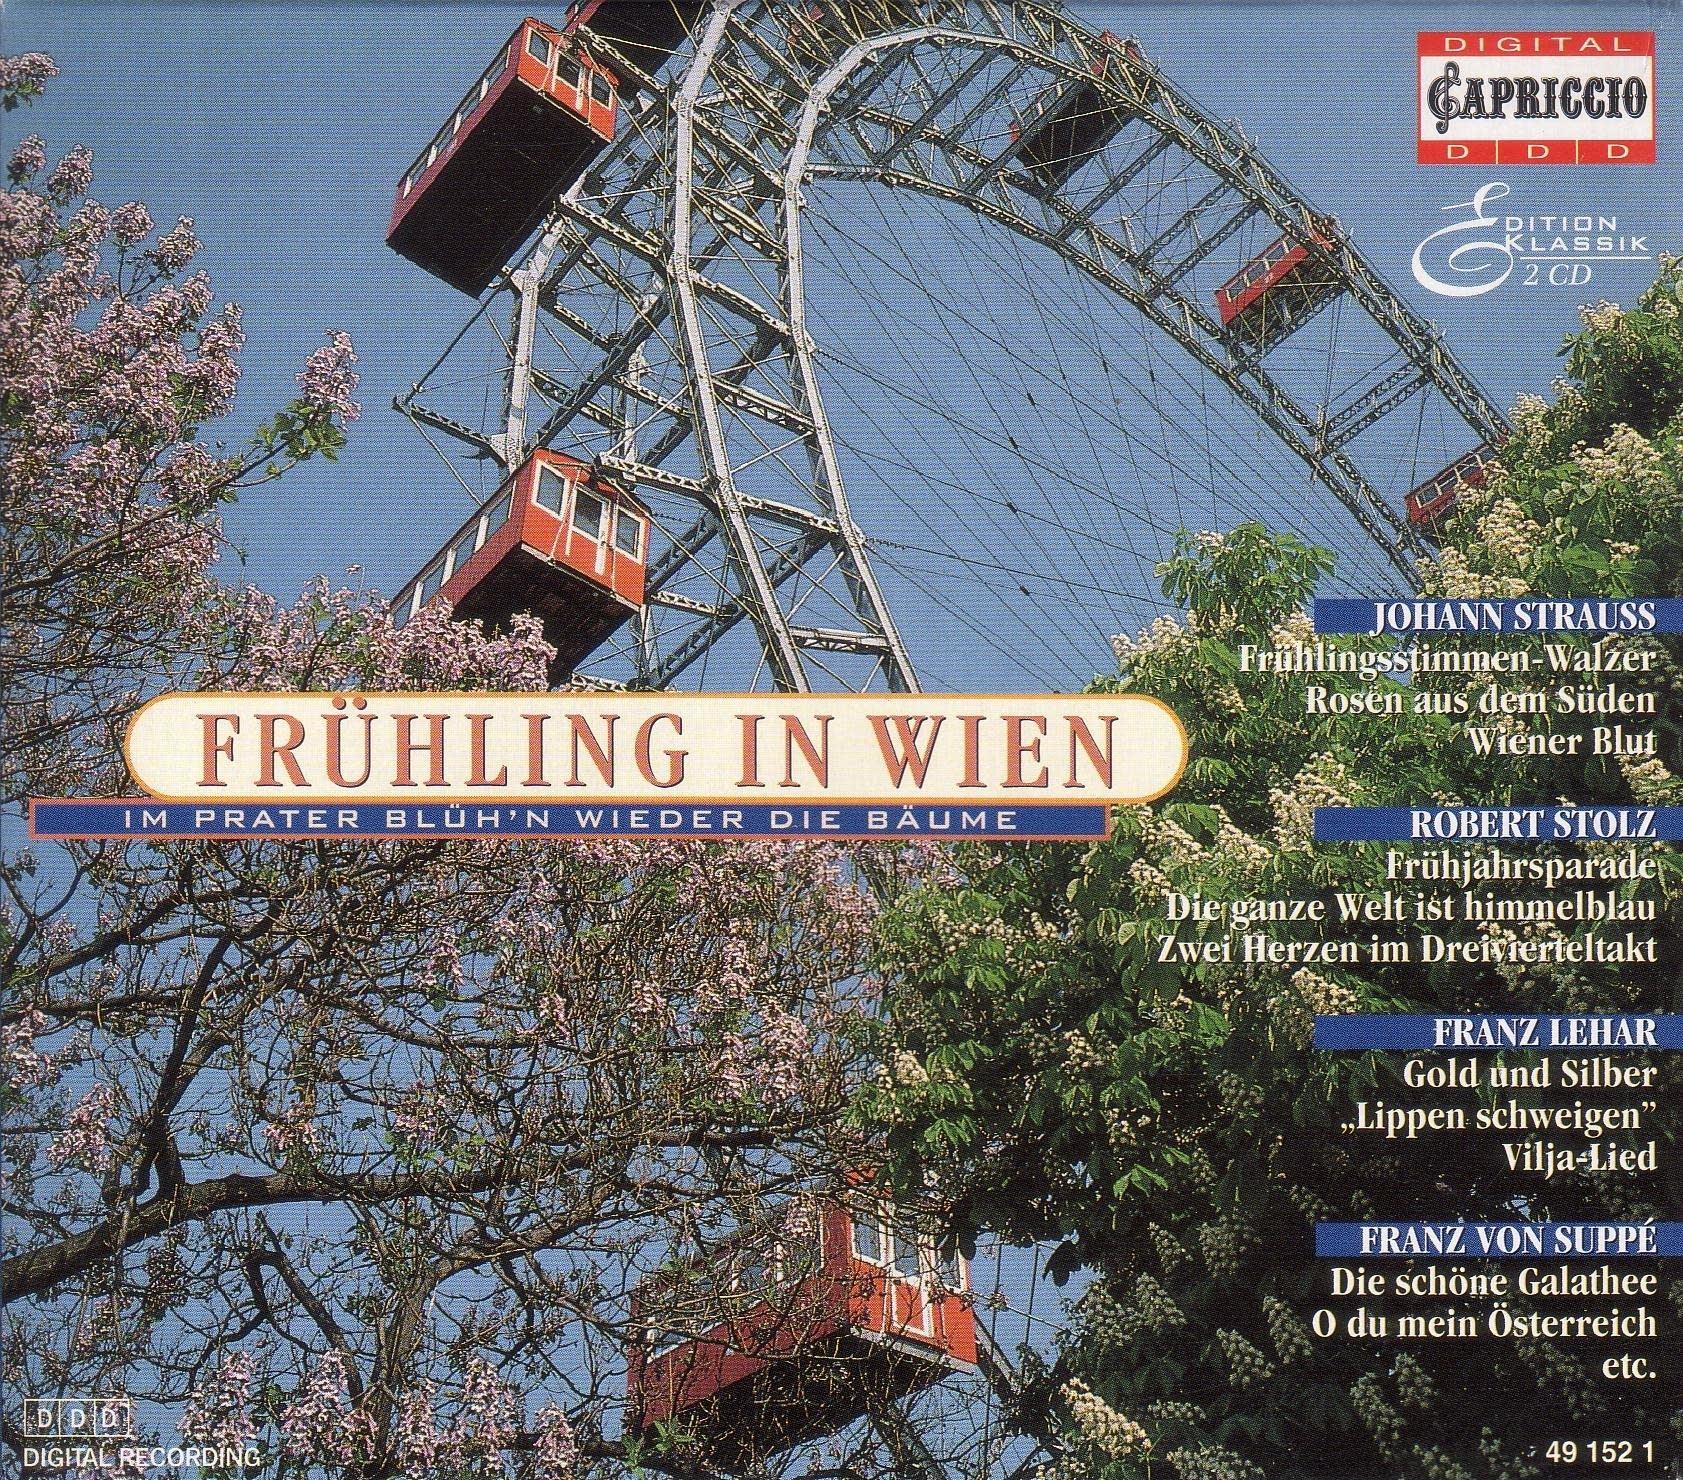 Johann Strauss II - Voices of Spring album cover